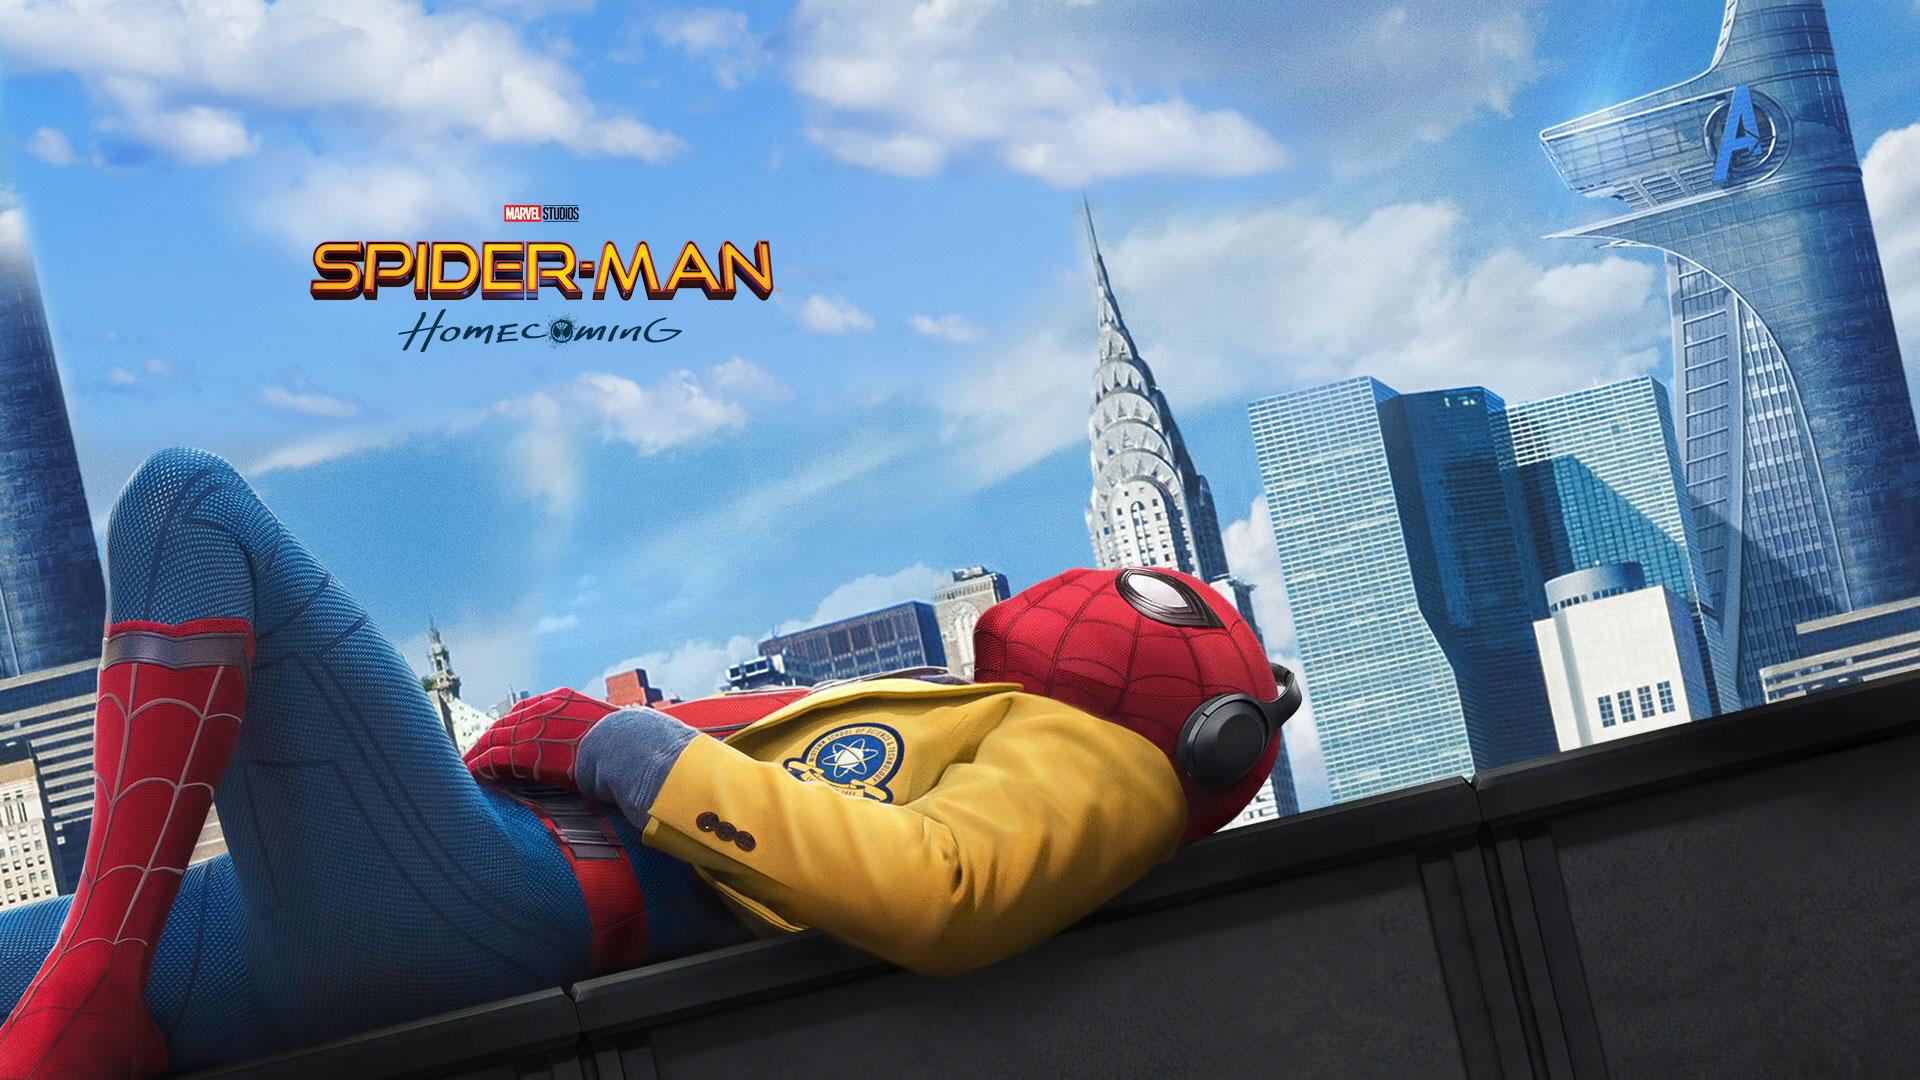 spider-man homecoming hd wallpaper | hintergrund | 1920x1080 | id